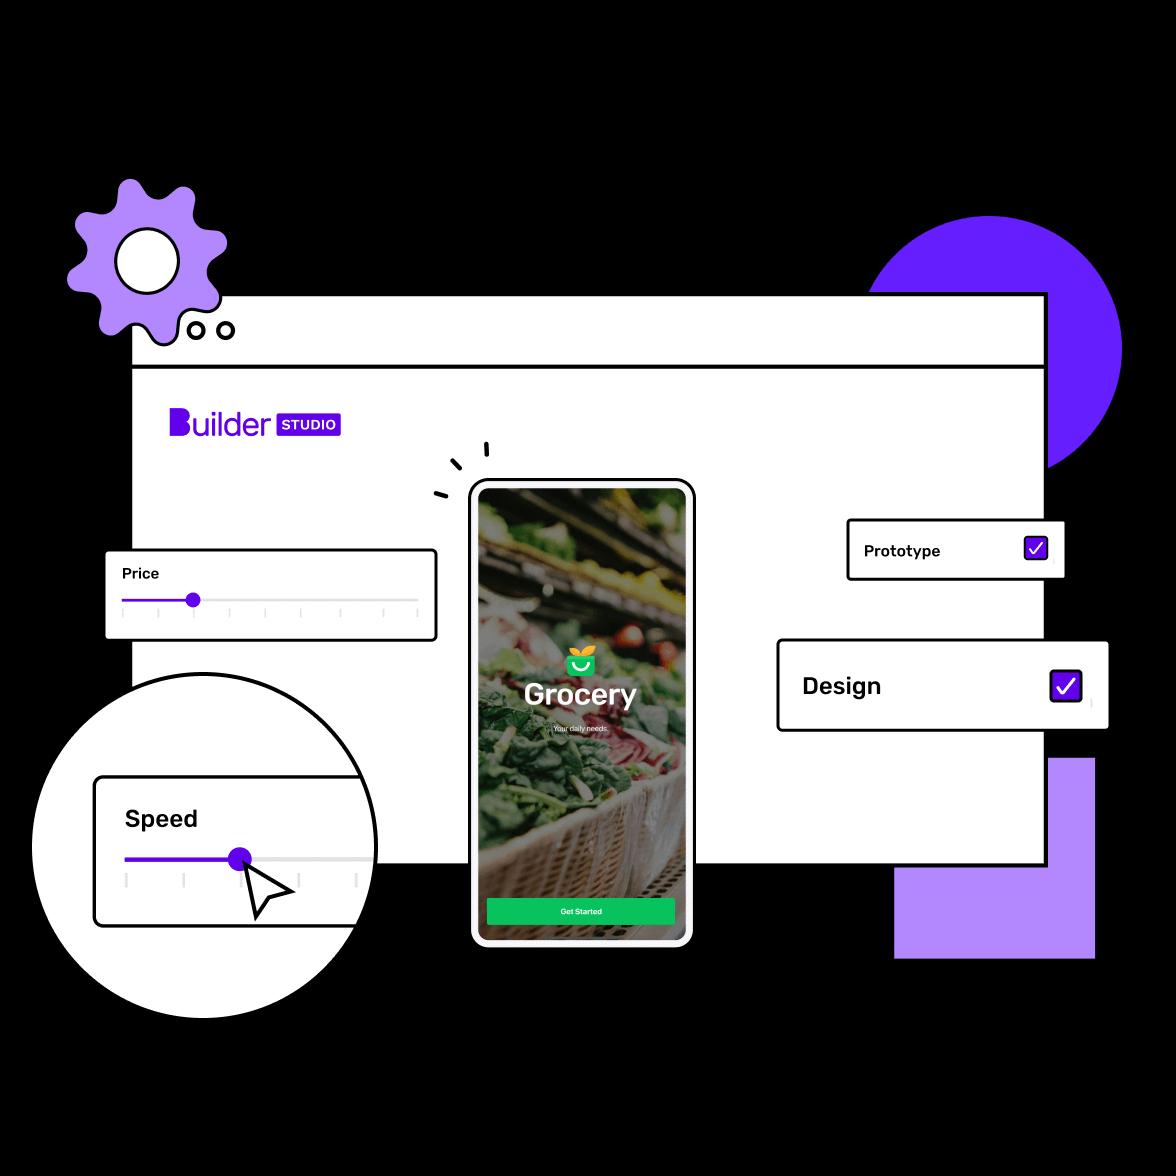 Billing cycle illustrative screen